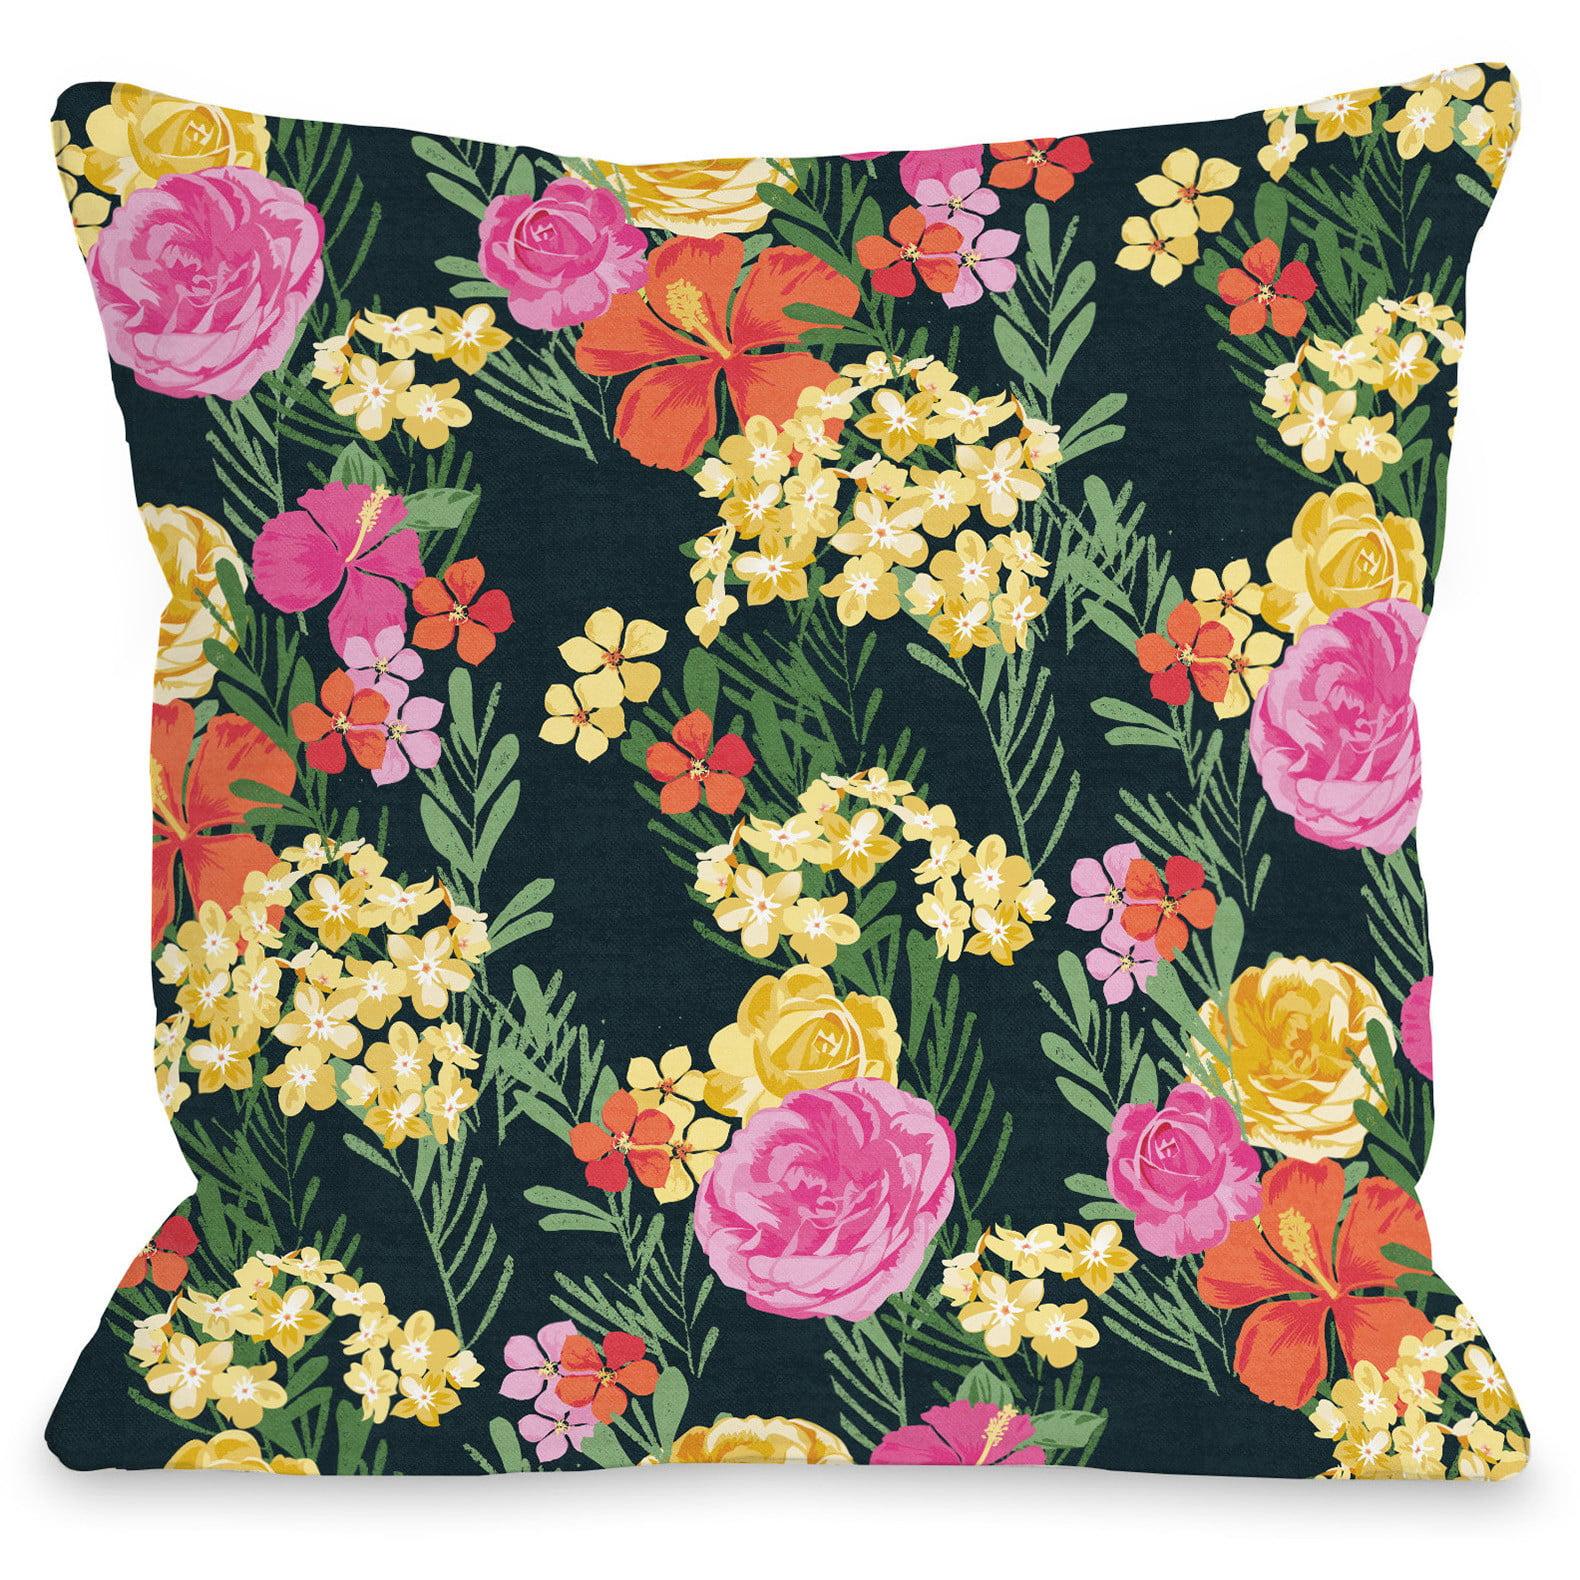 """Botanica"" Outdoor Throw Pillow by Jennifer Ellory, 20""x20"""